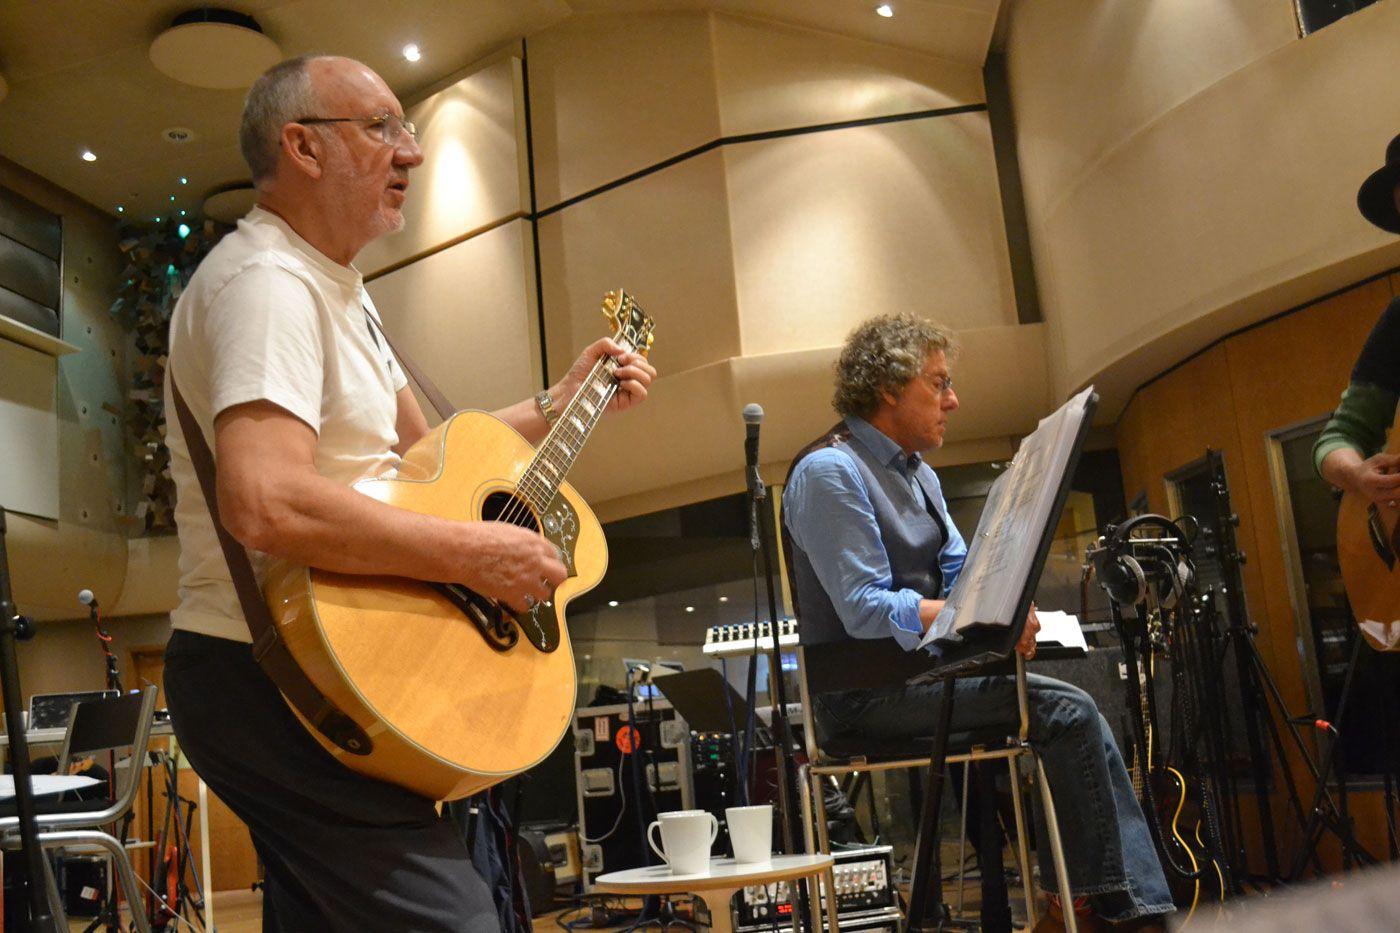 The Who hoje: só Townshend e Daltrey. Moon e Entwhistle já faleceram.